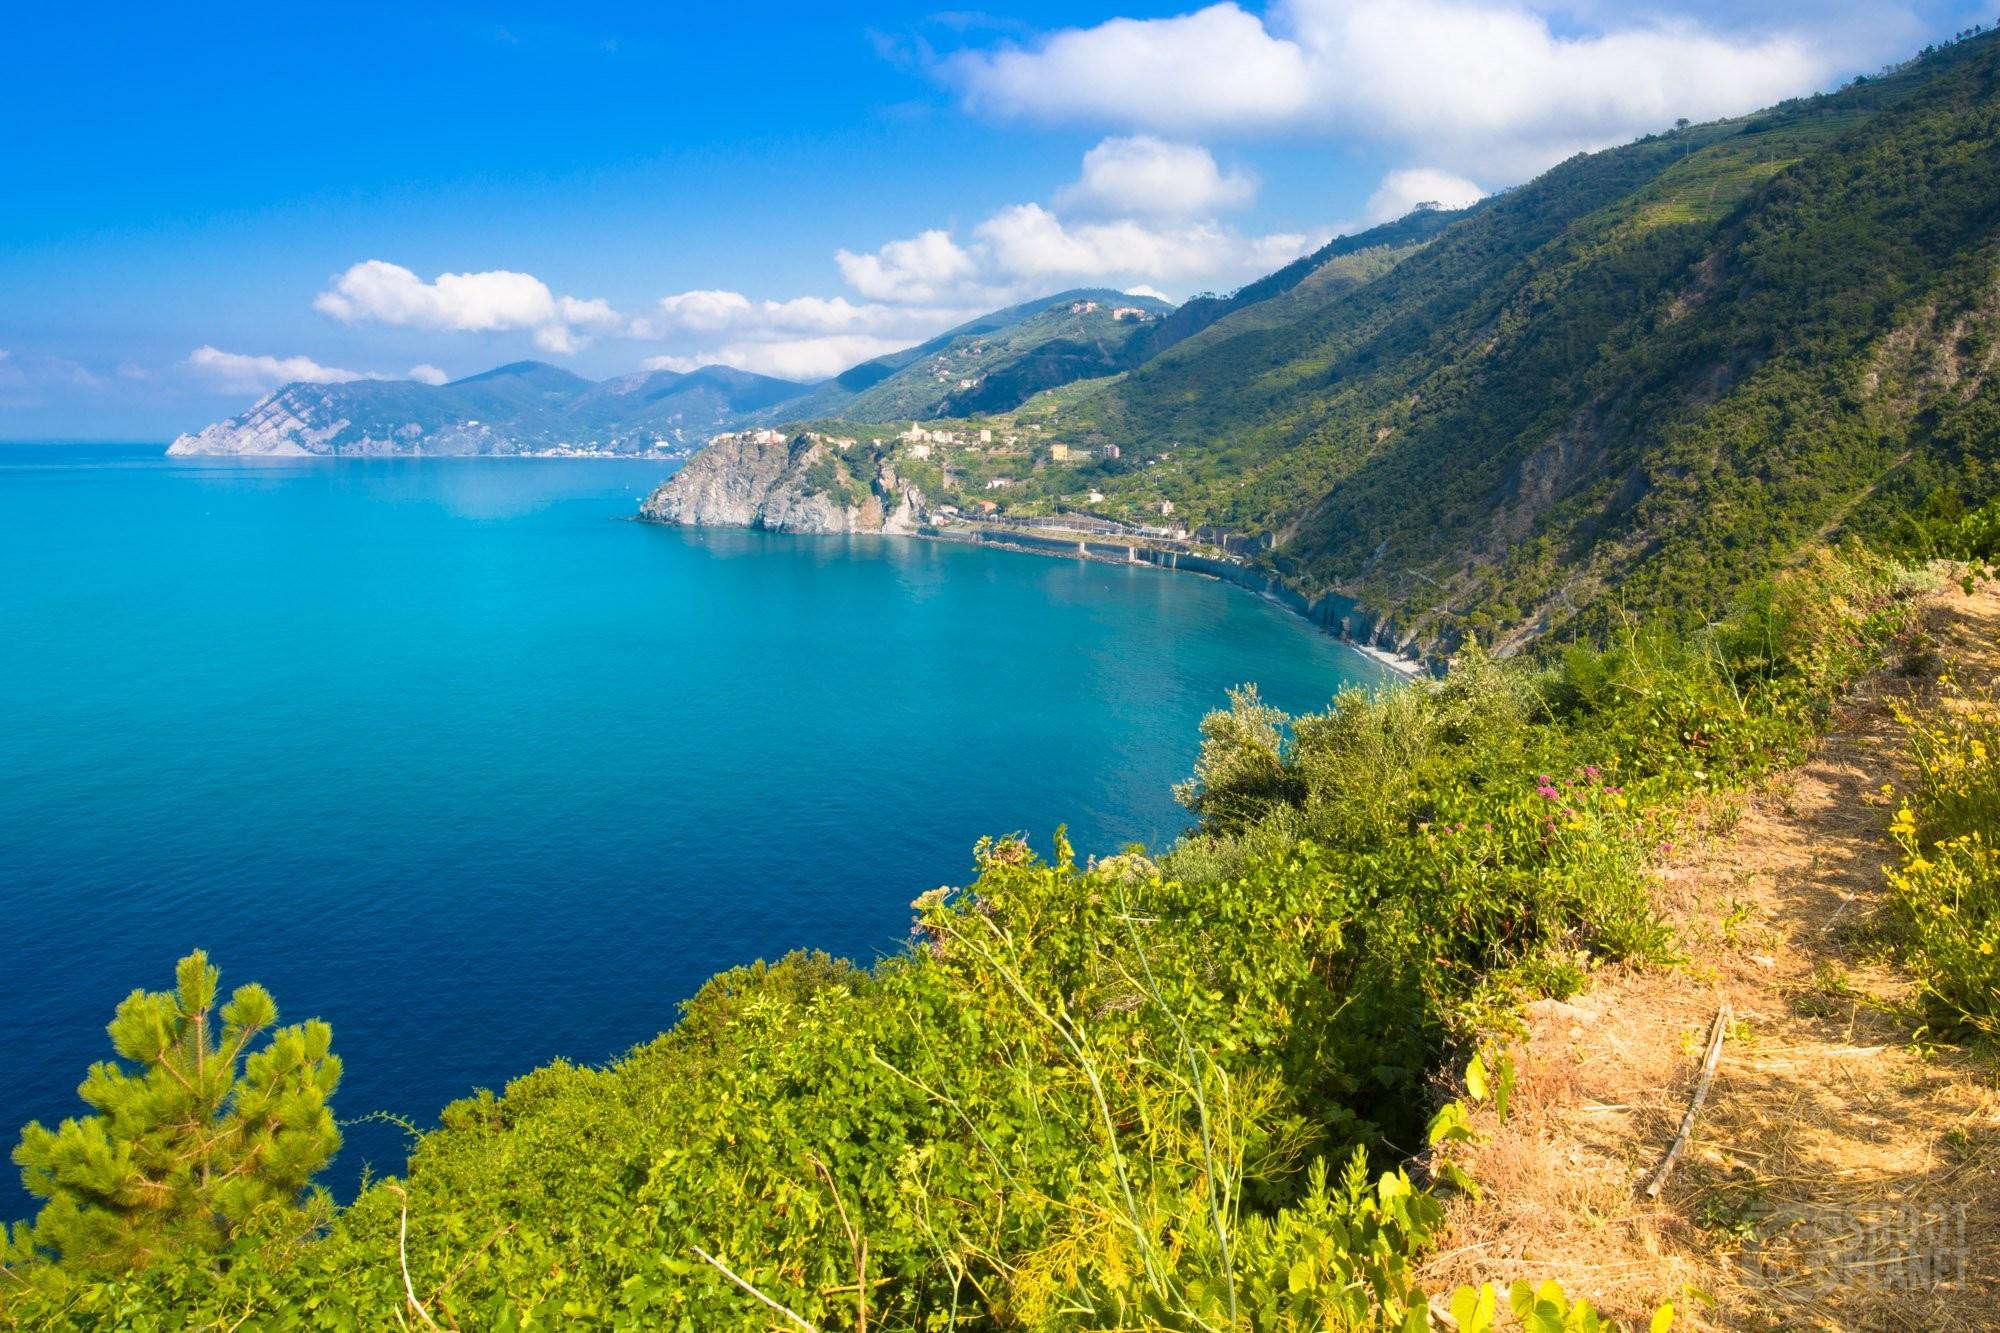 Trails of Cinque Terre in Italy